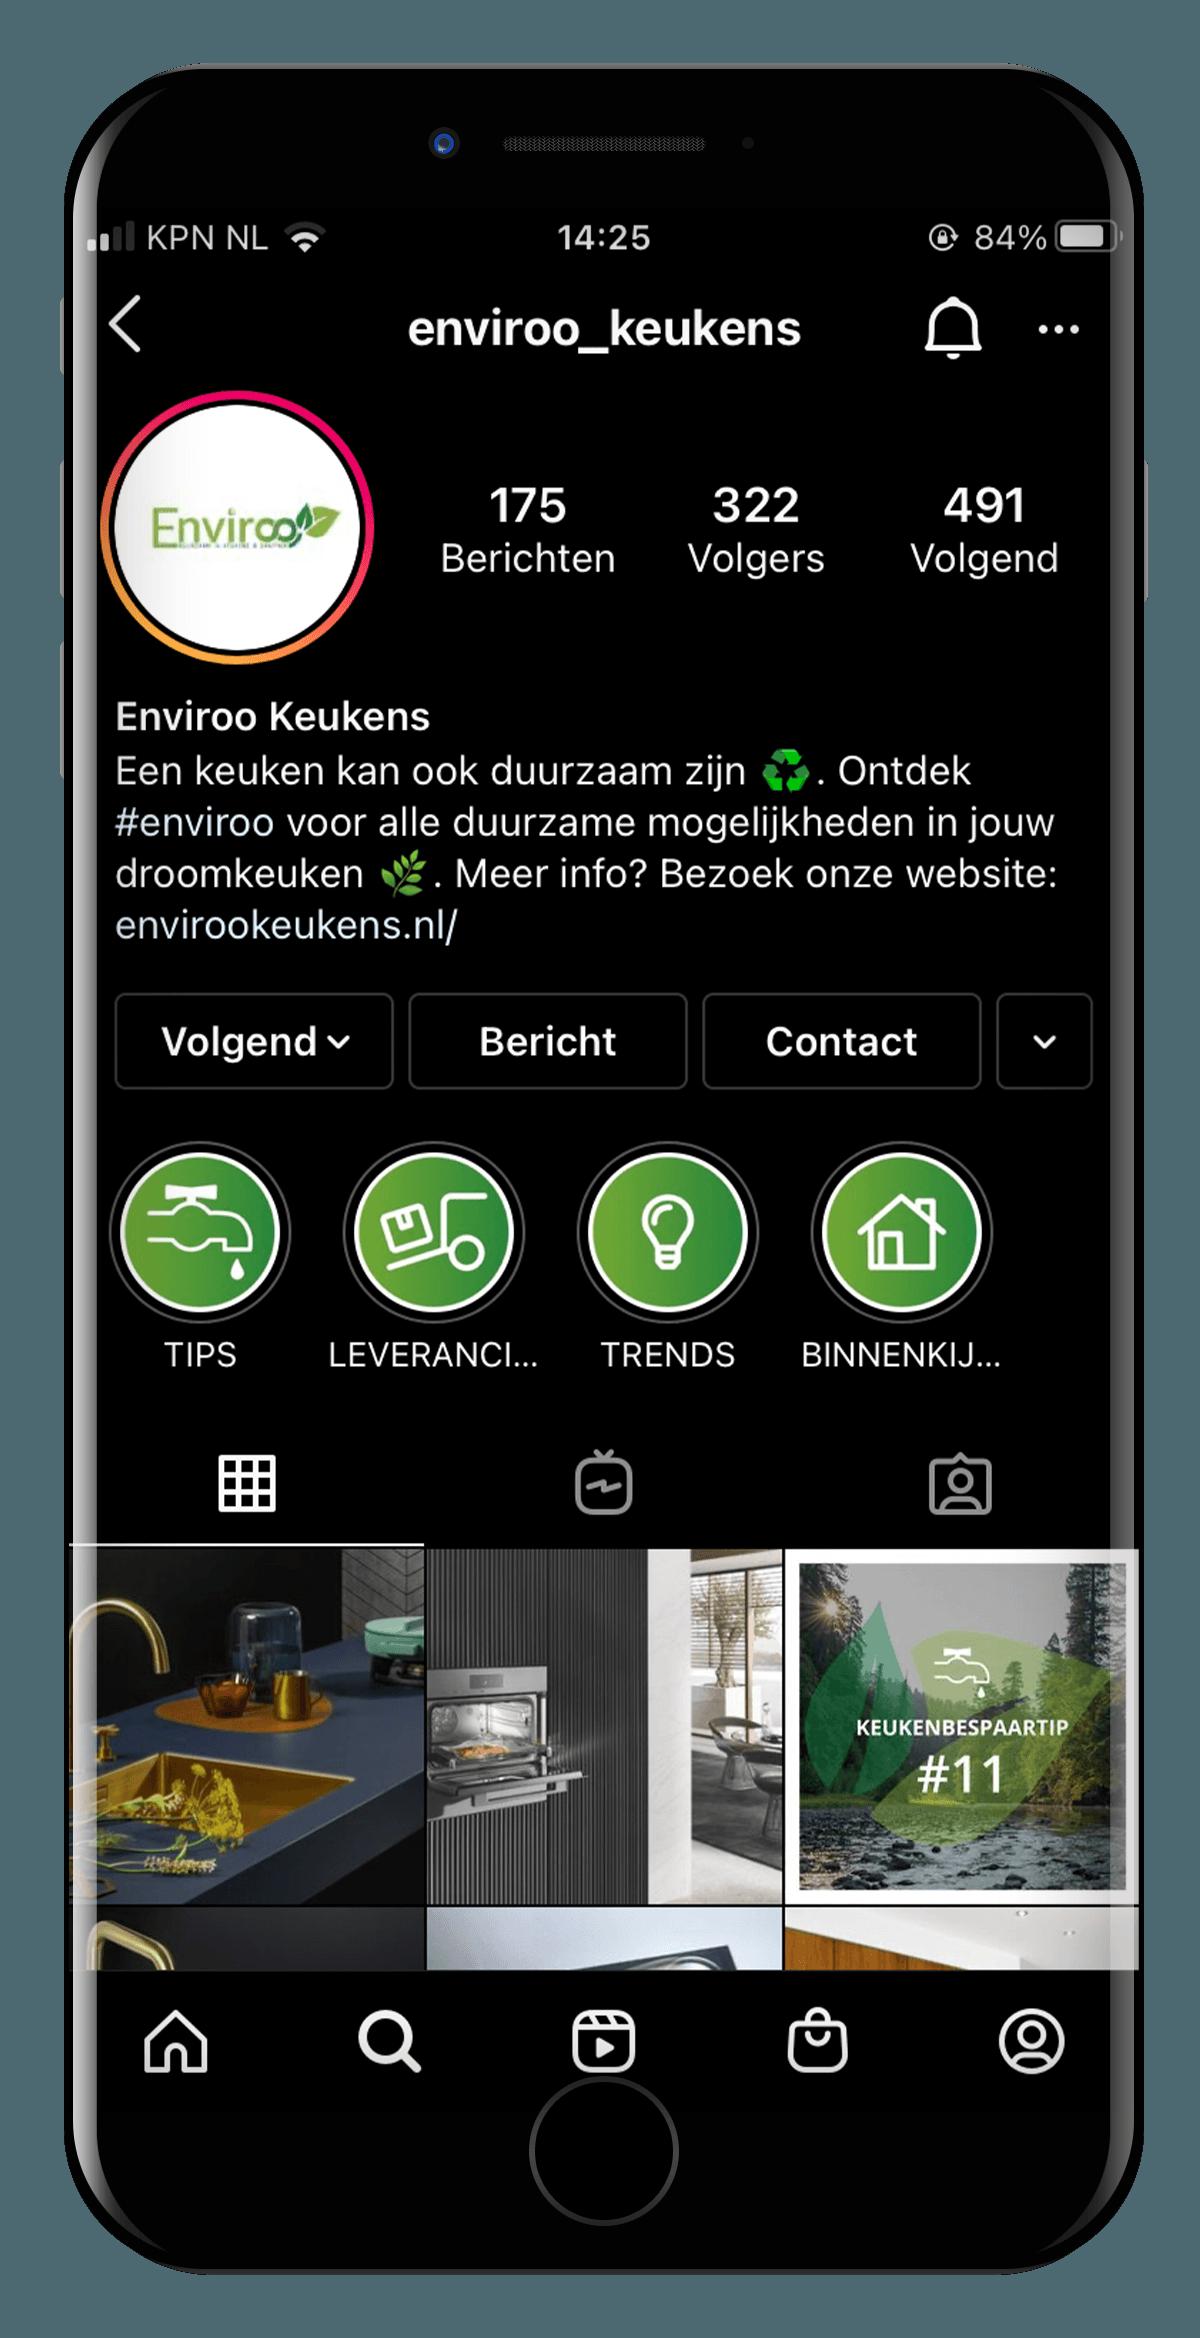 SociaLLien-made-marketing-enviroo-instagram